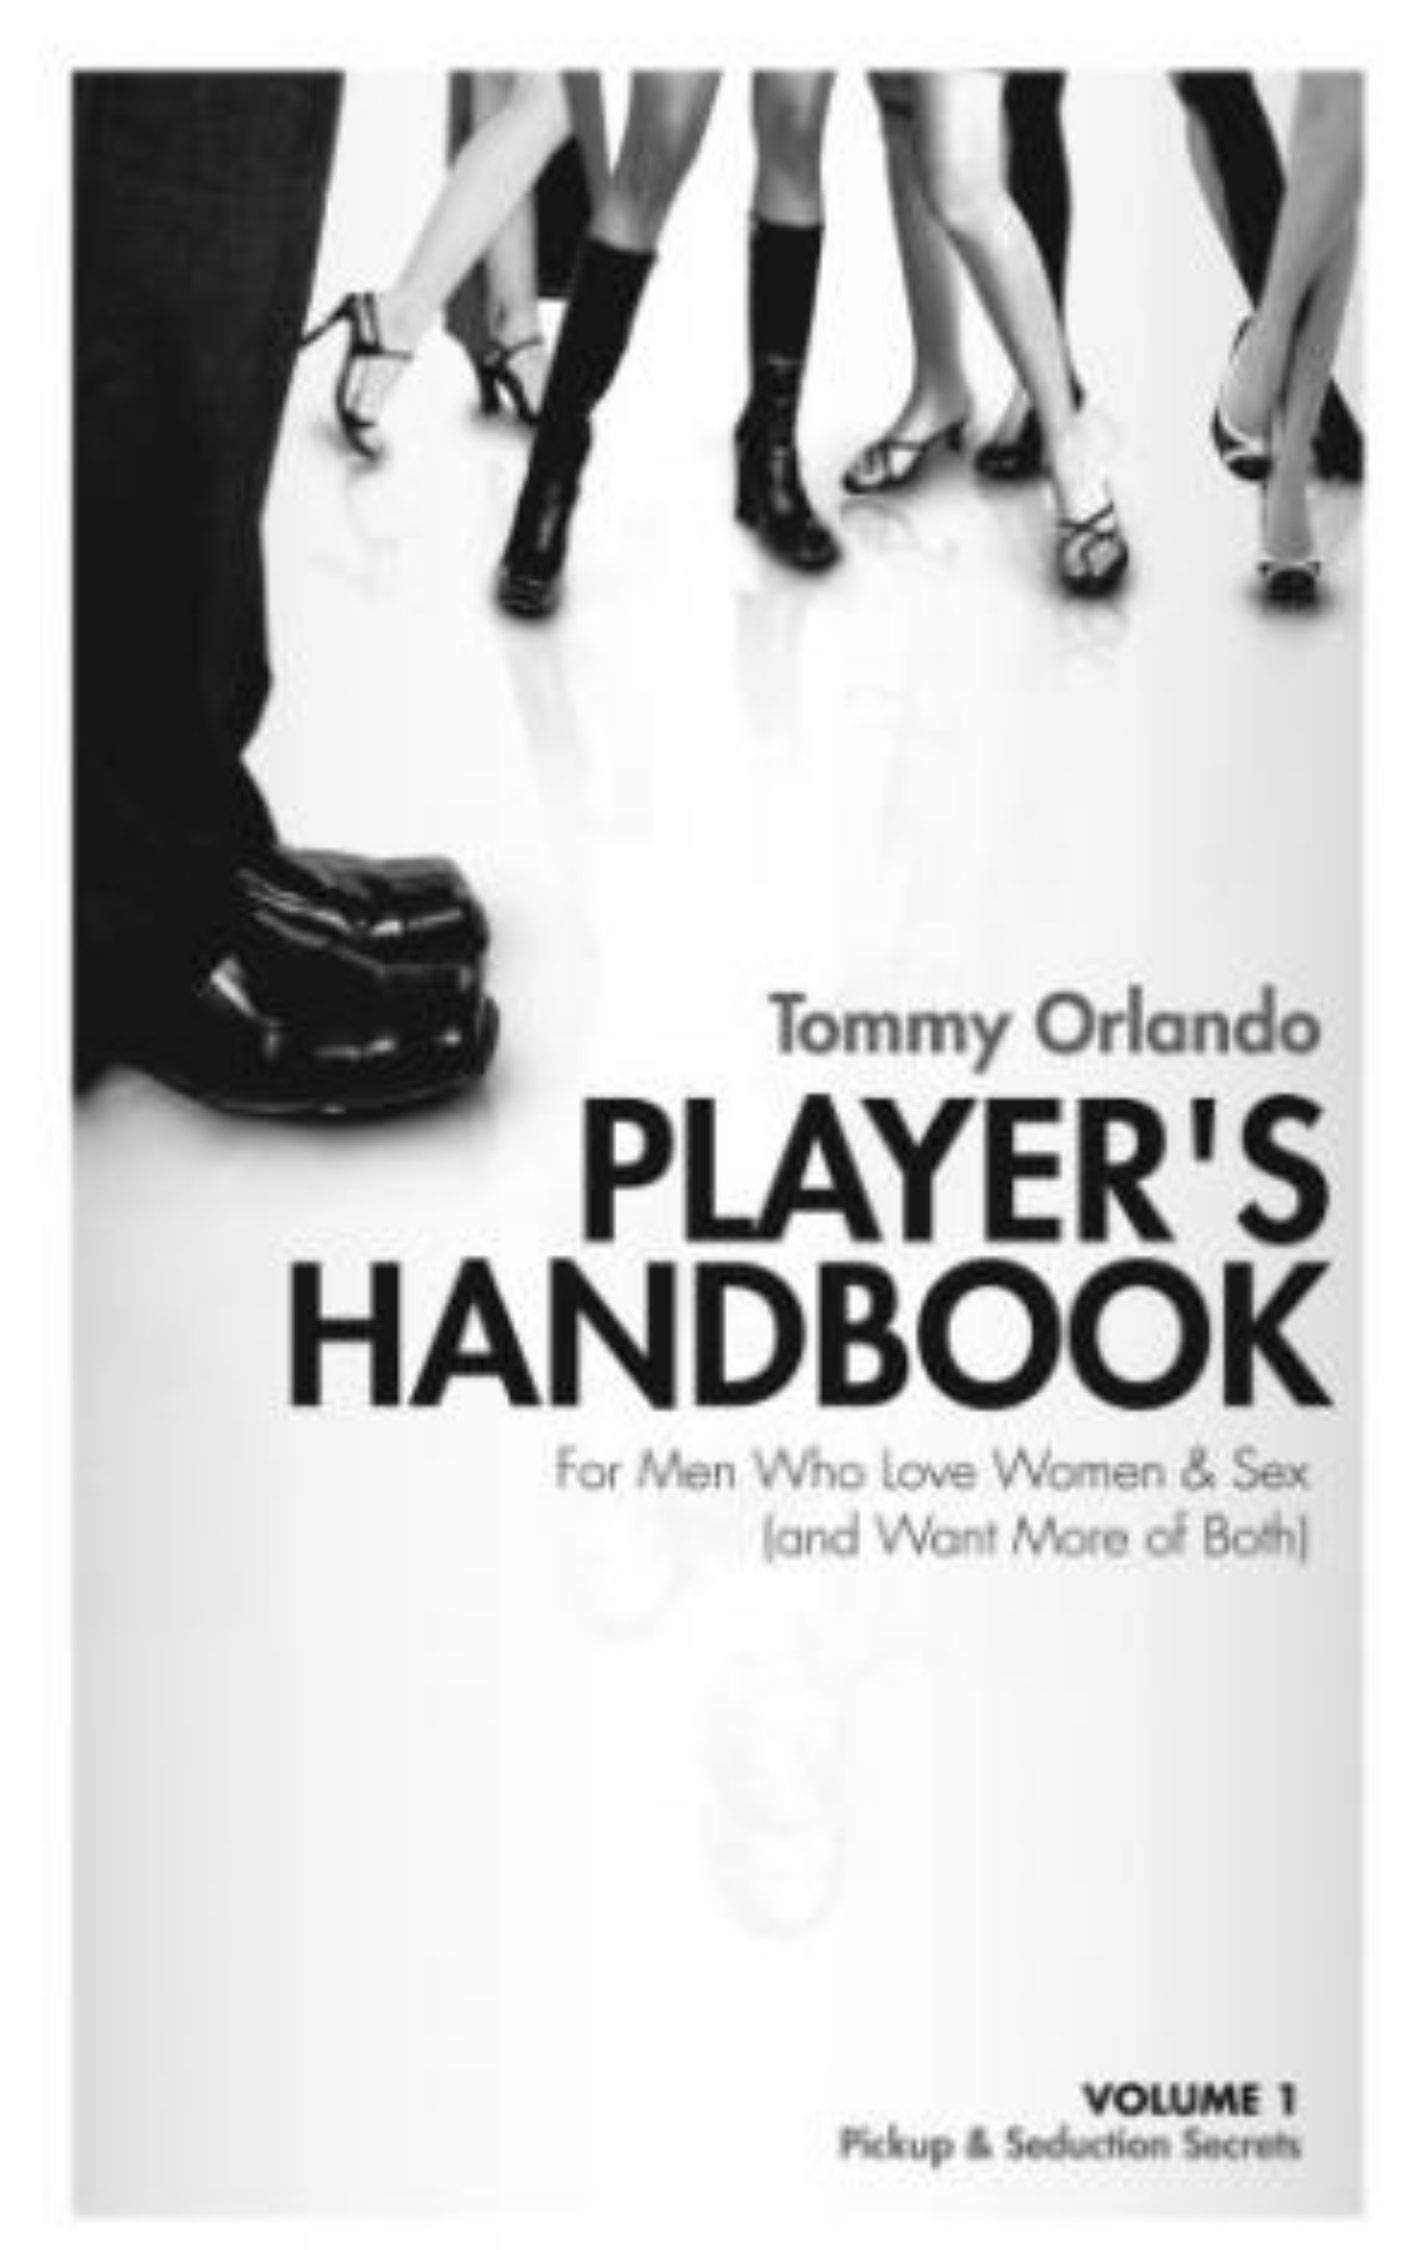 Handbook Volume 20   Pickup and Seduction Secrets for Men Who Love ...